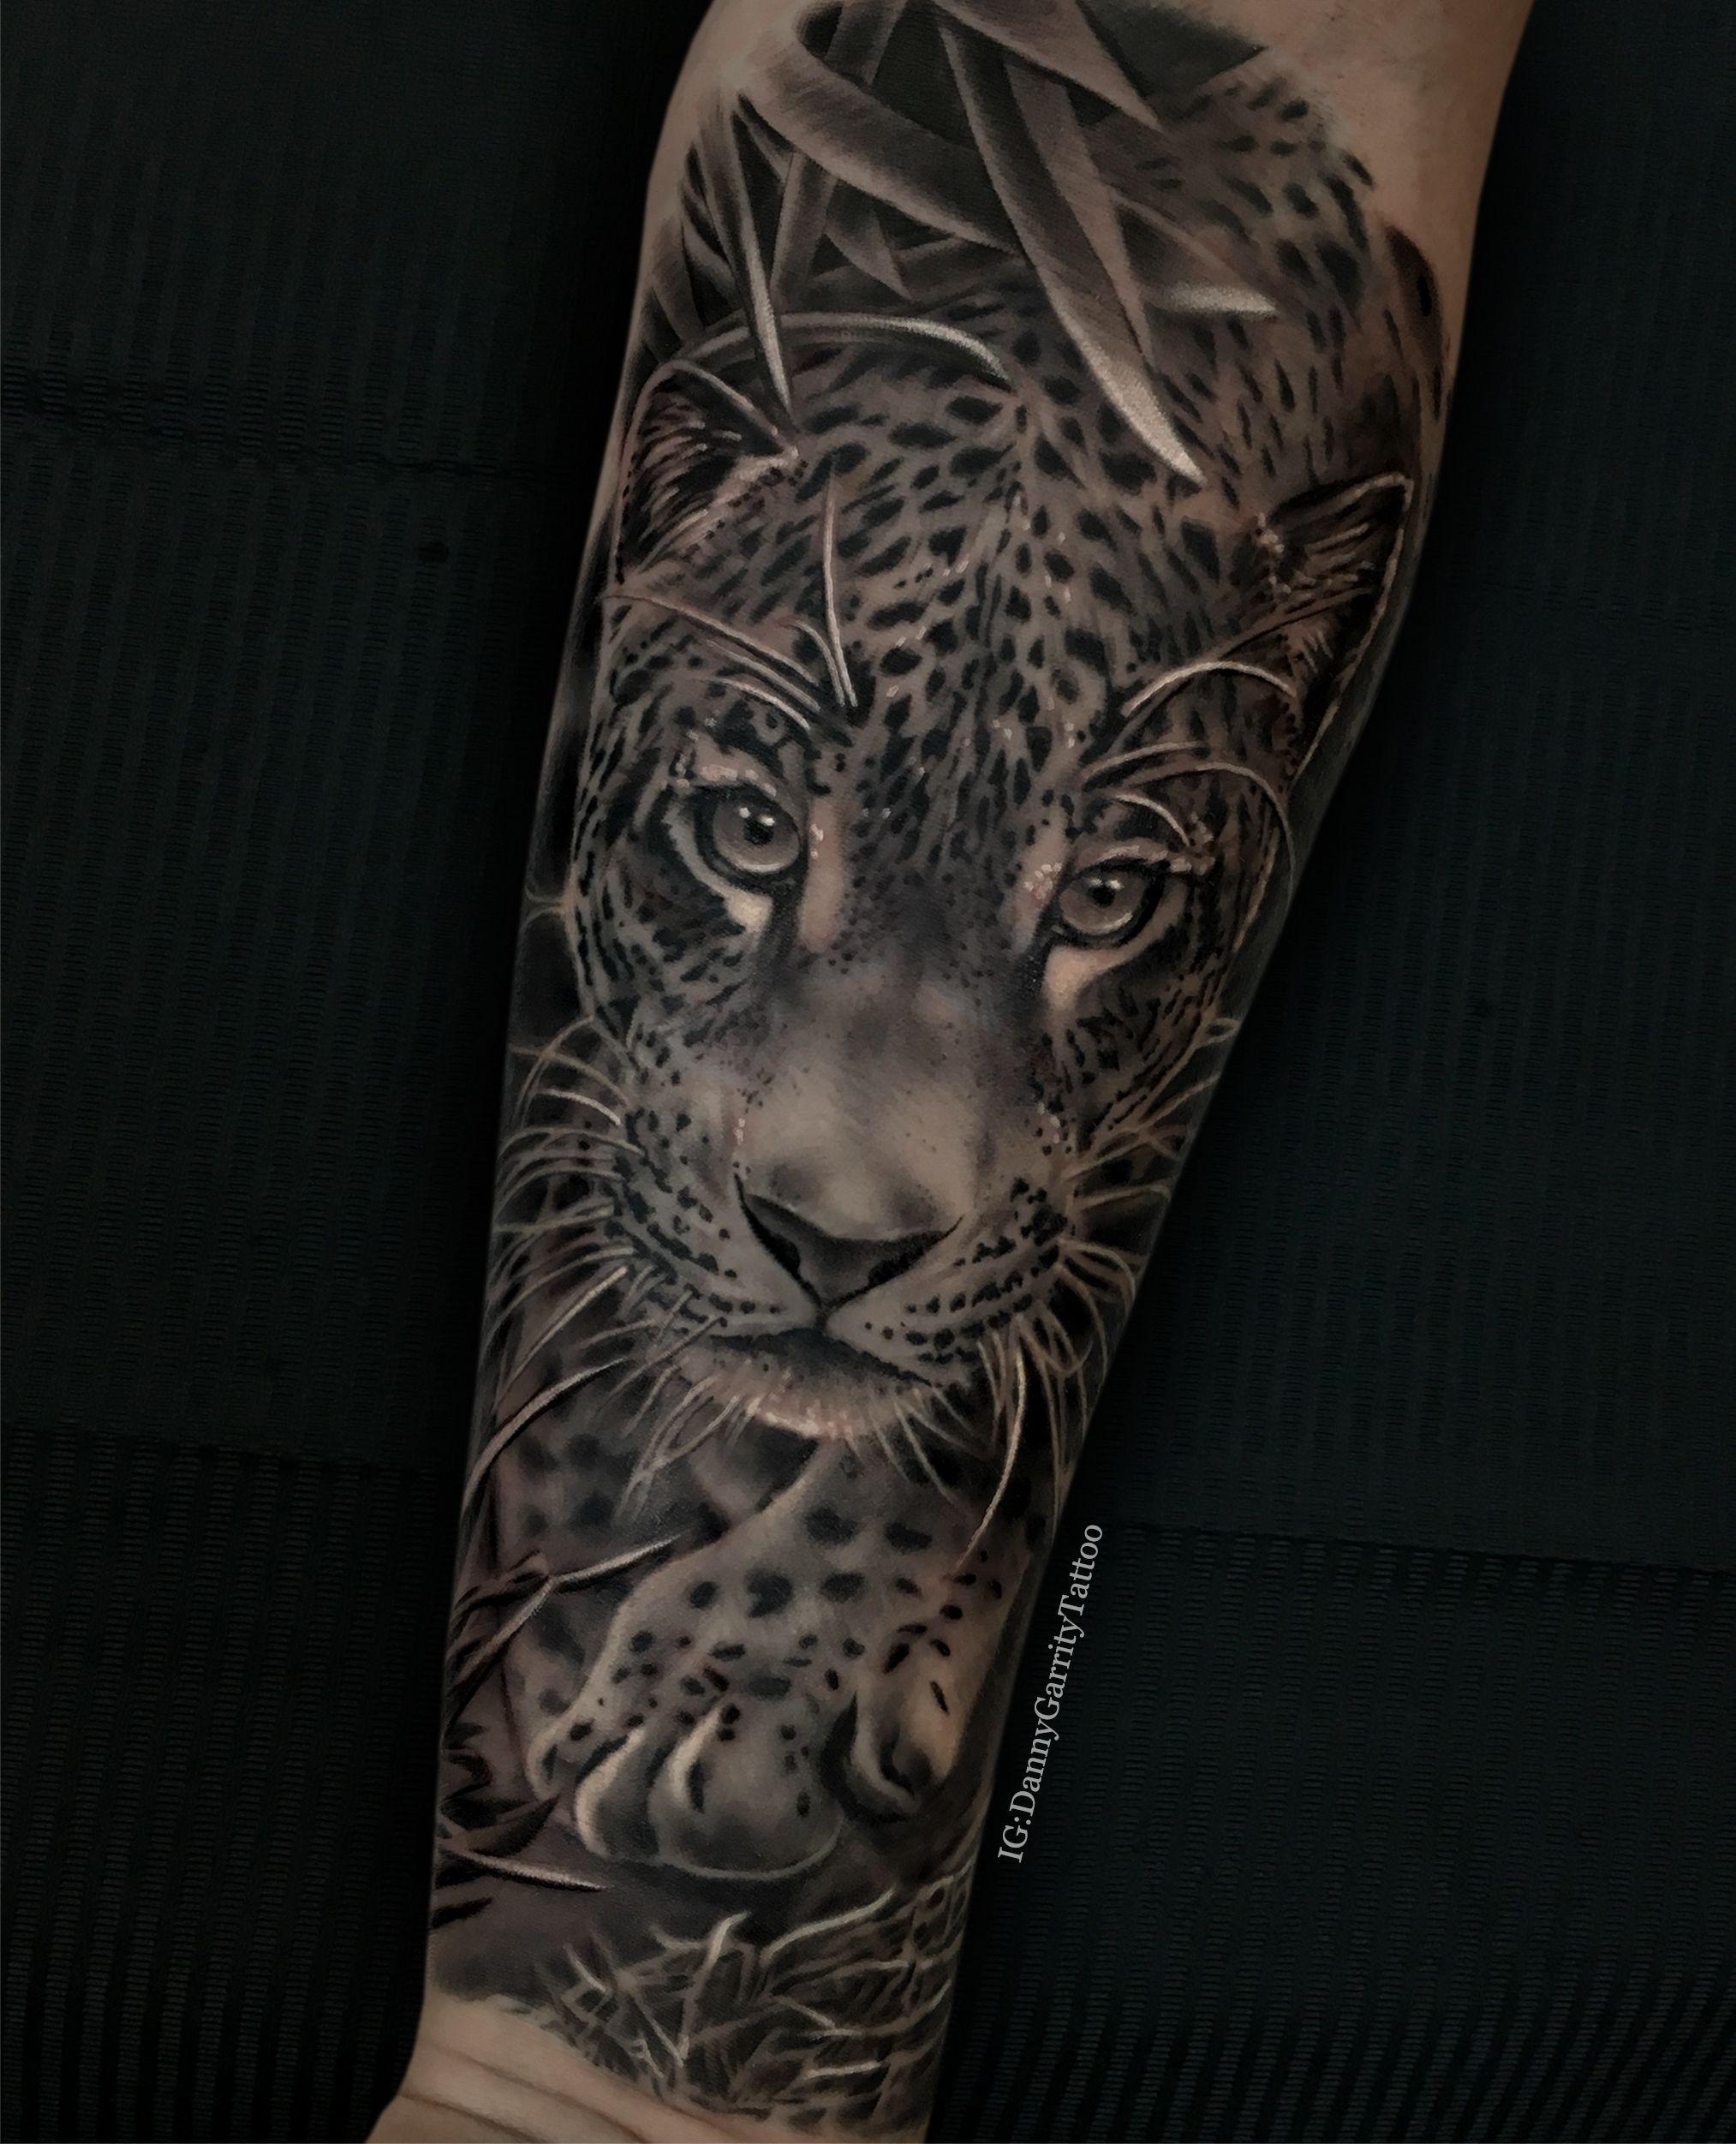 Men S Forearm Sleeve Tattoo Realistic Leopard In Black And Grey Tatuagem Animal Tatuagem Jaguar Tatuagens De Mulheres